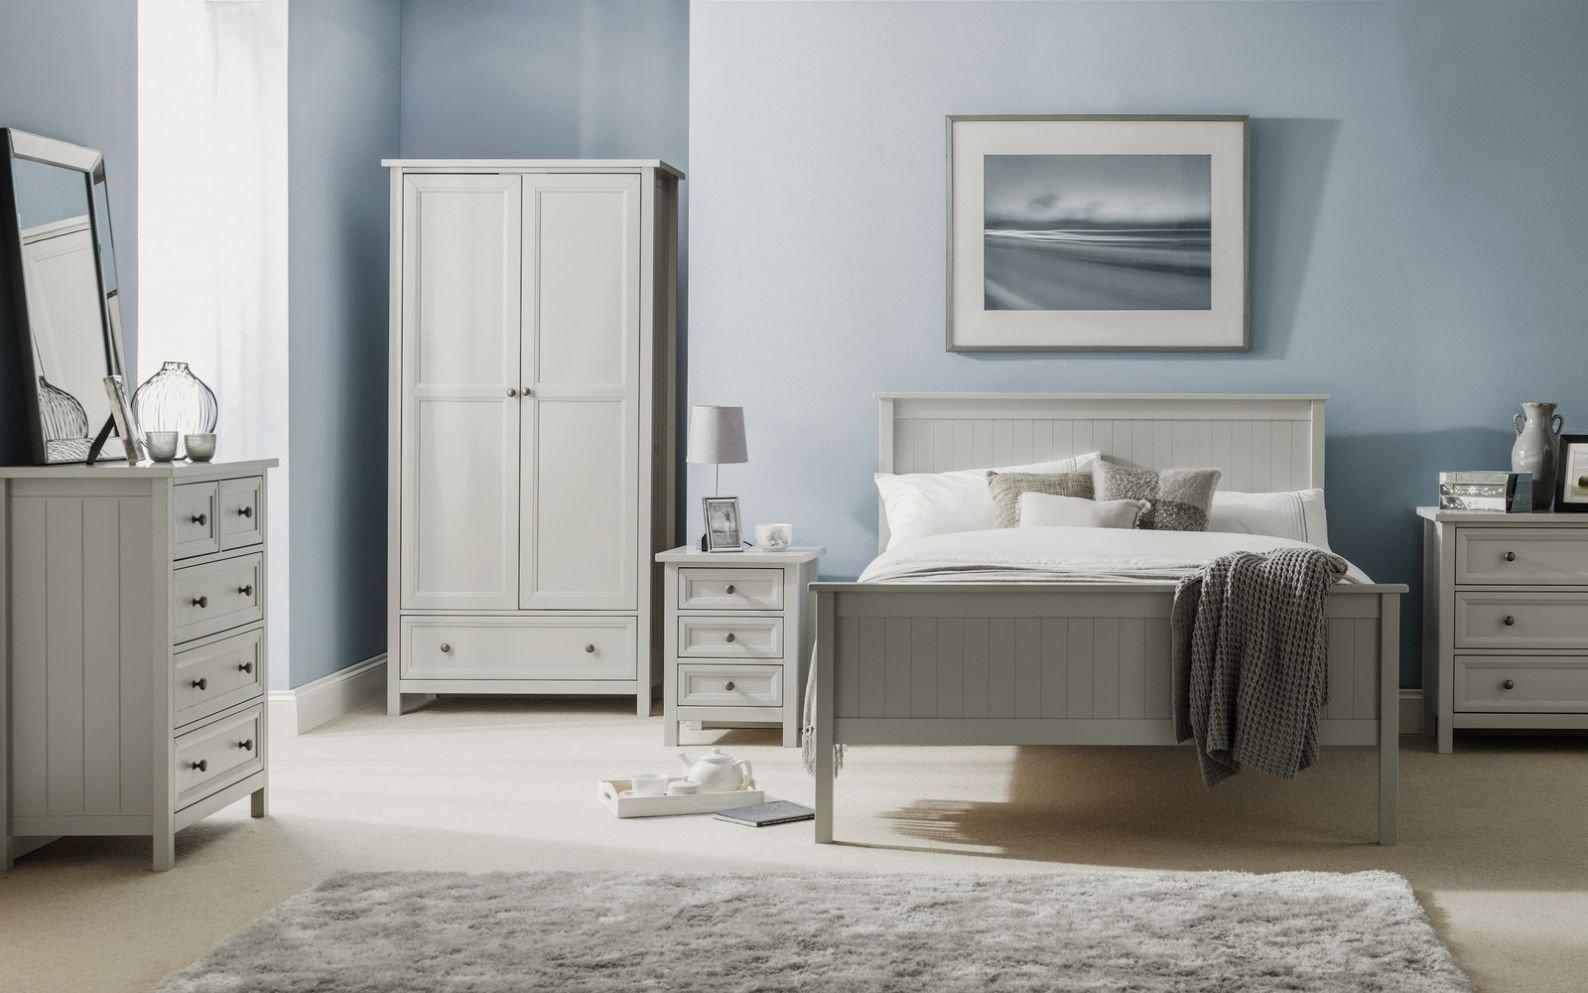 White Gloss Bedroom Furniture Luxury Julian Bowen Monaco Grey High Gloss Bedroom Range Bedsides